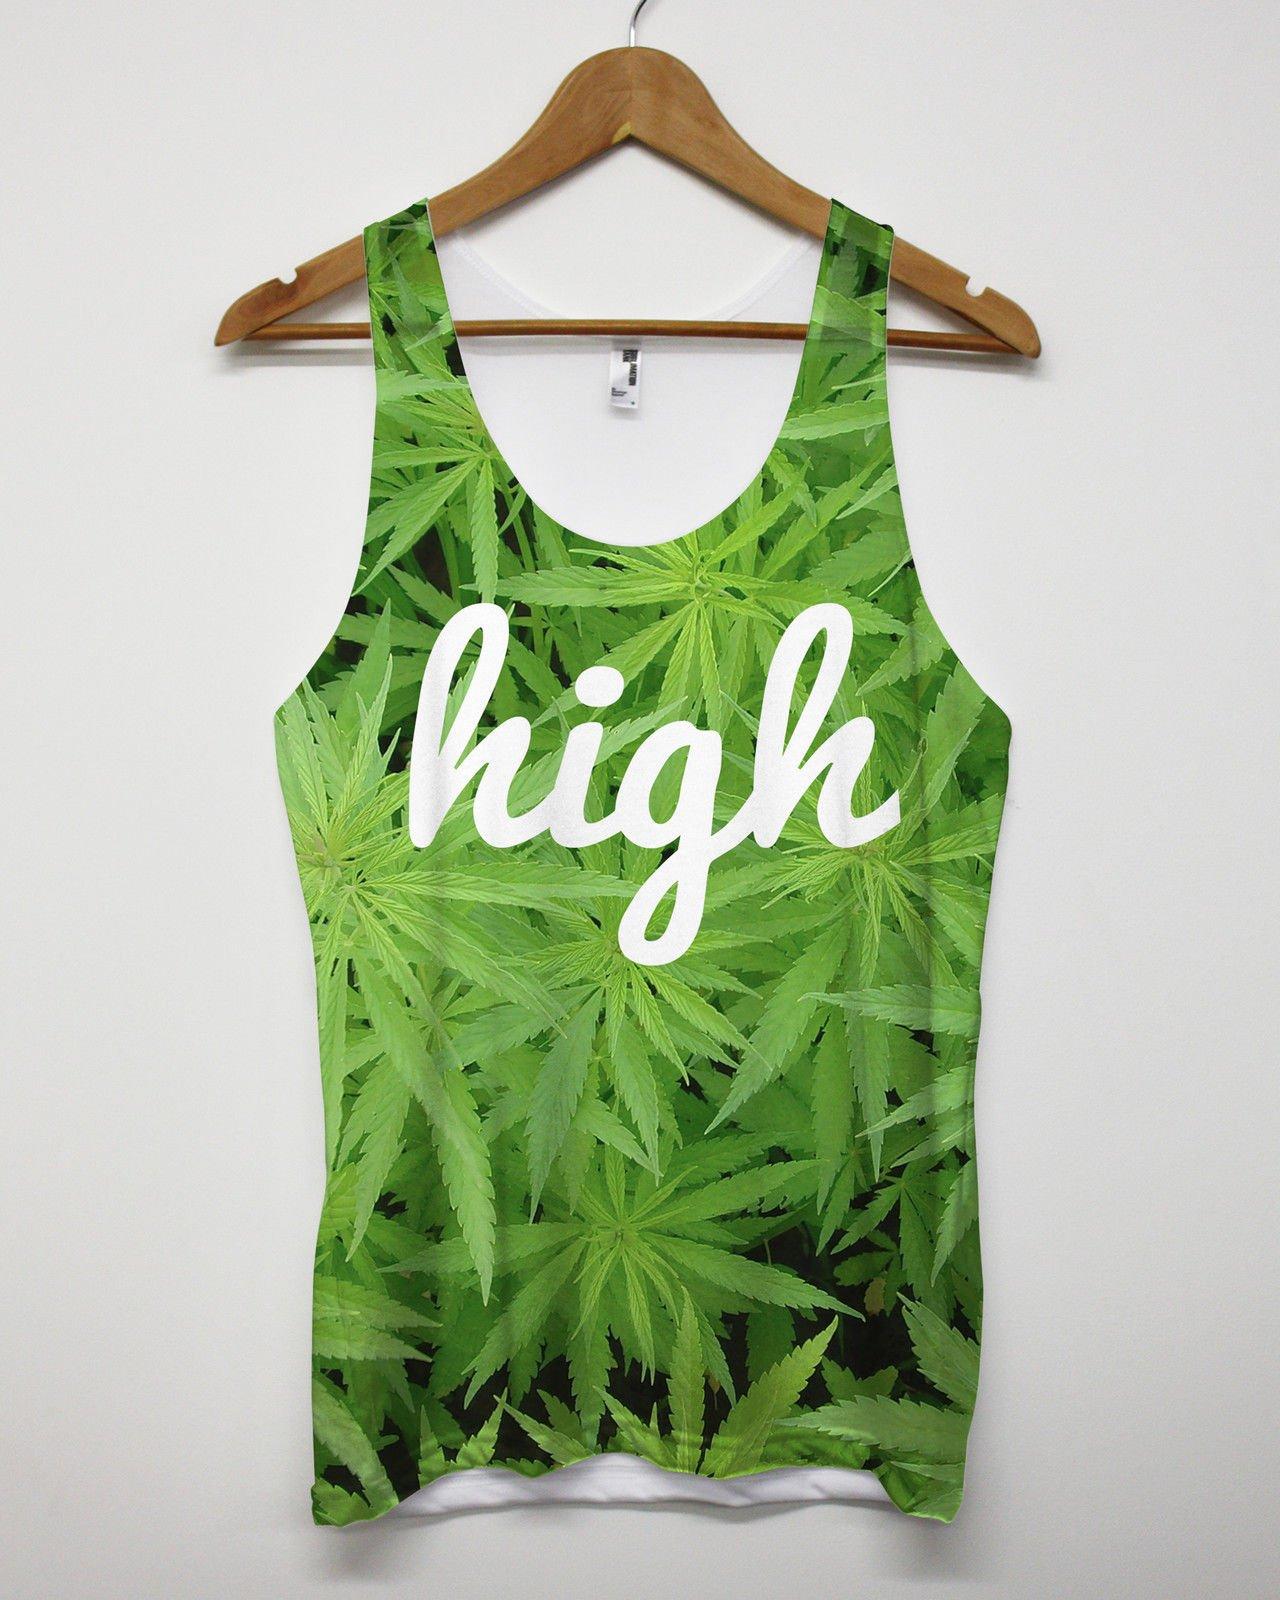 Inct Men's High Cannabis All Over Print Tank